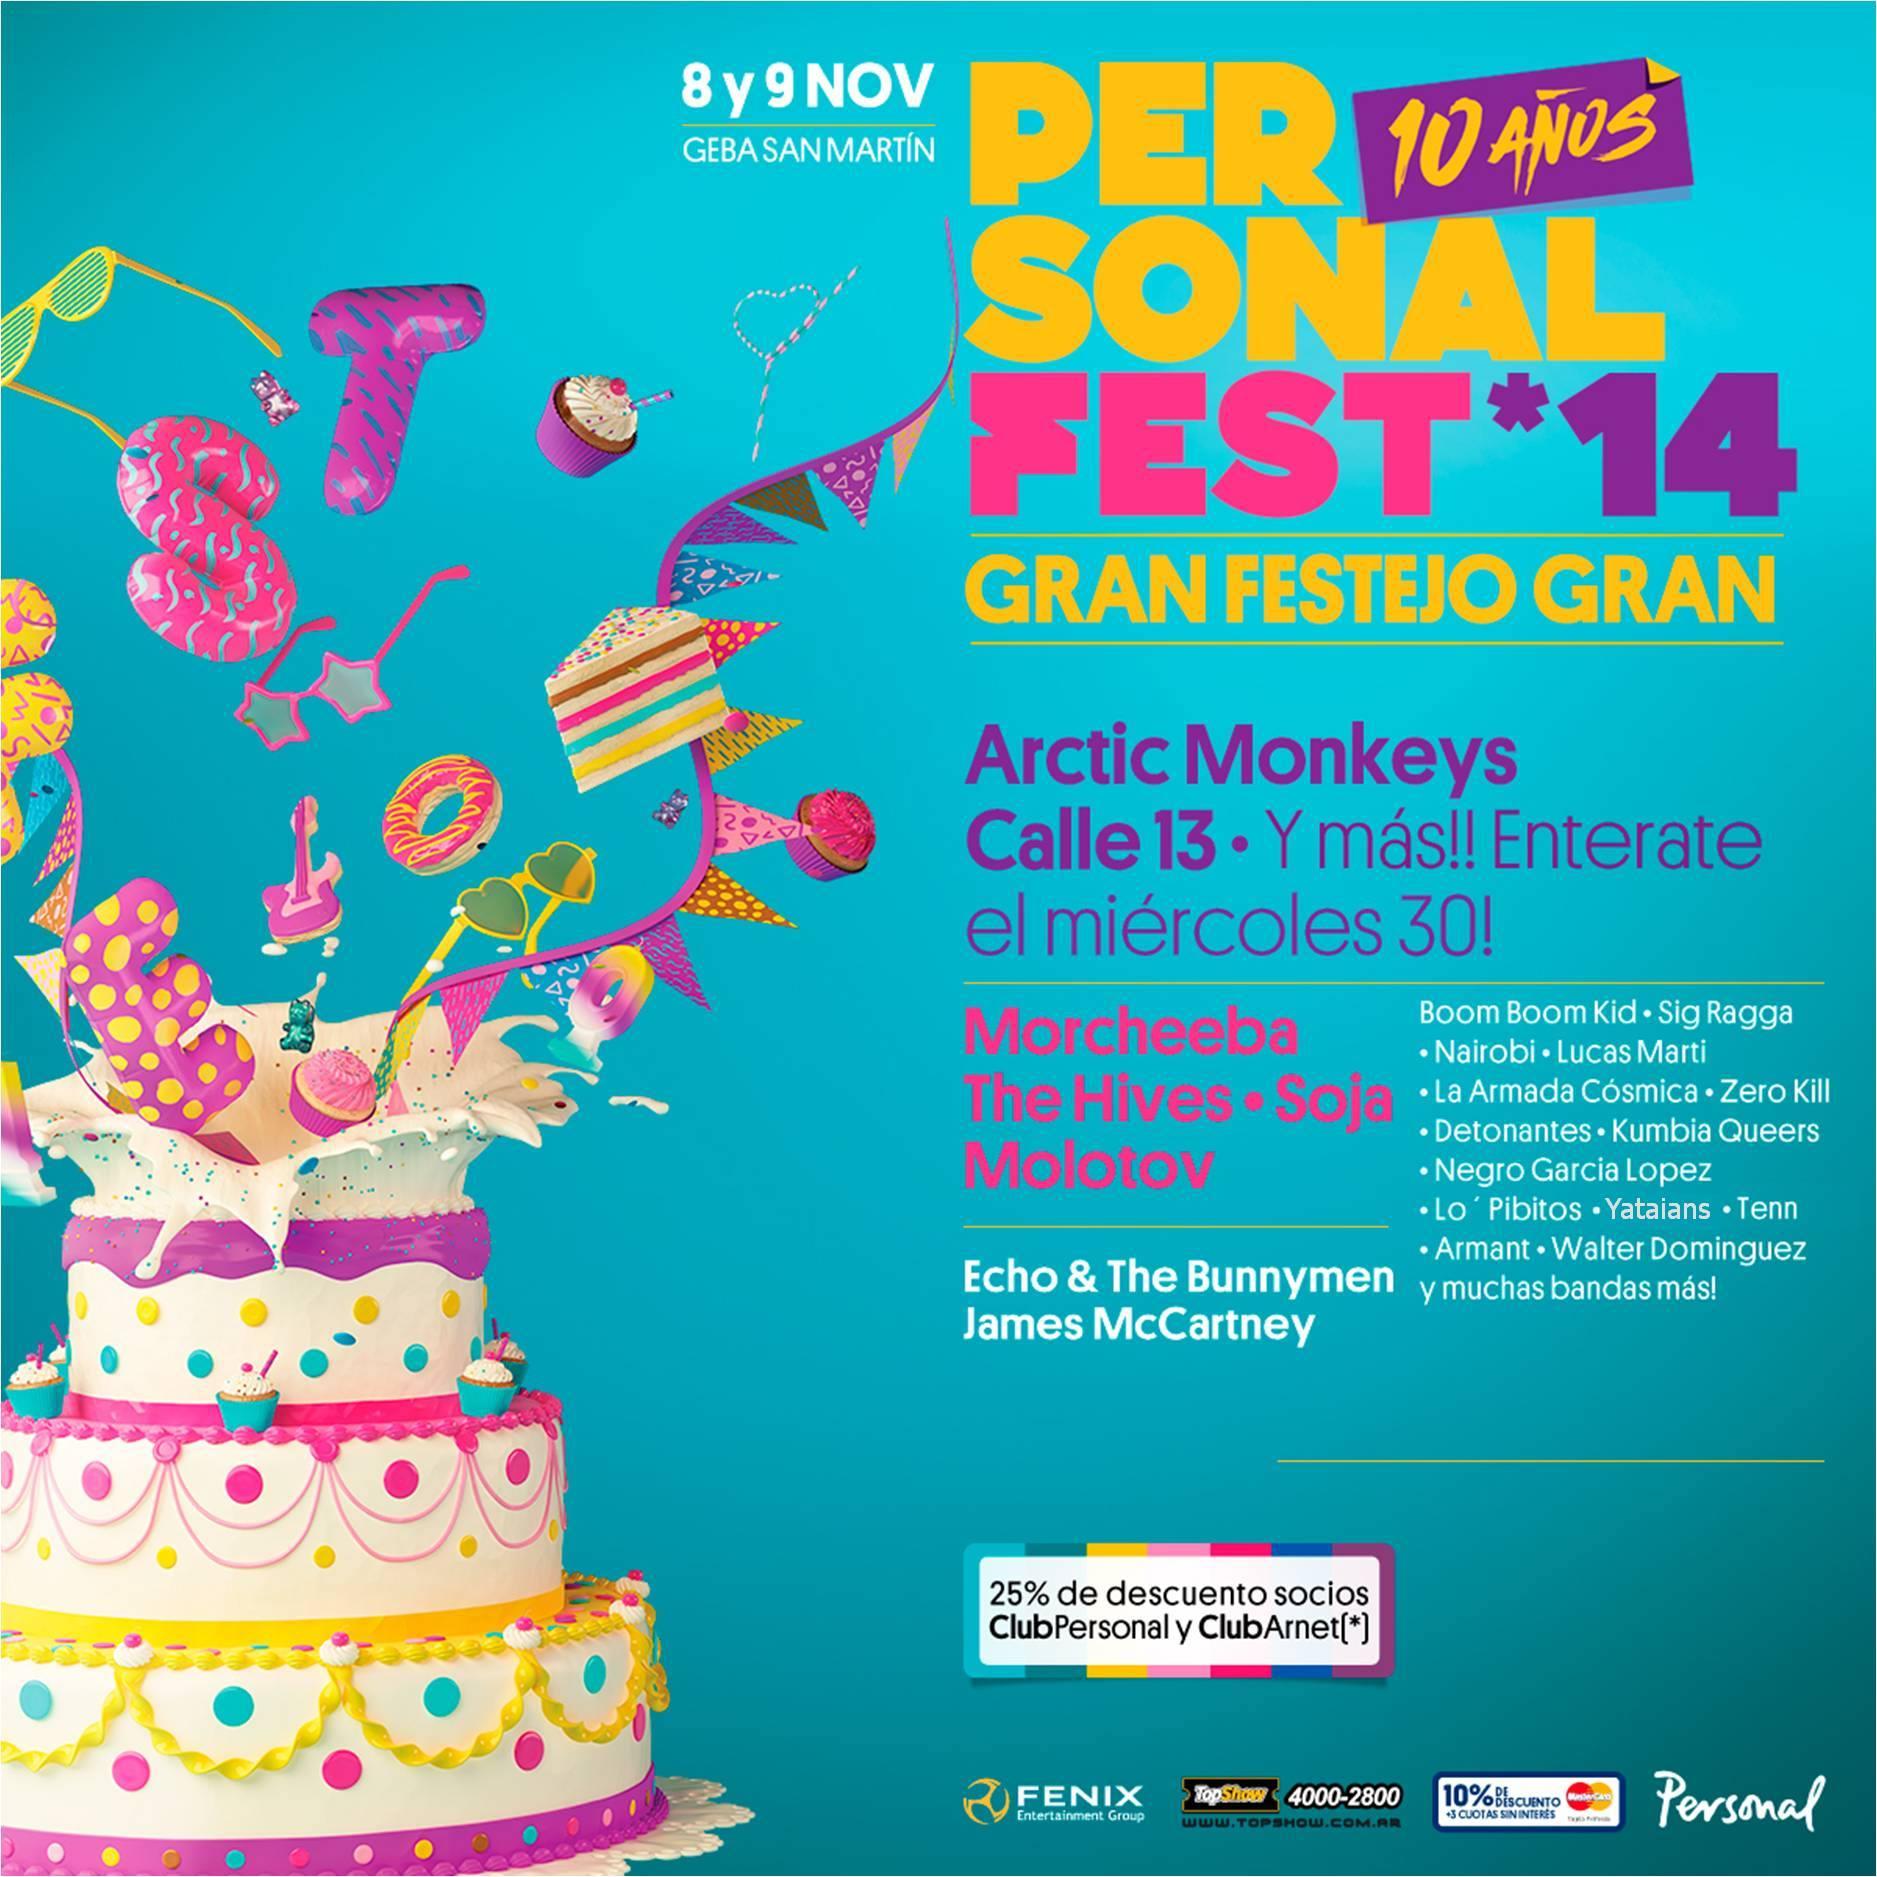 Cartel provisional del Personal Fest 2014